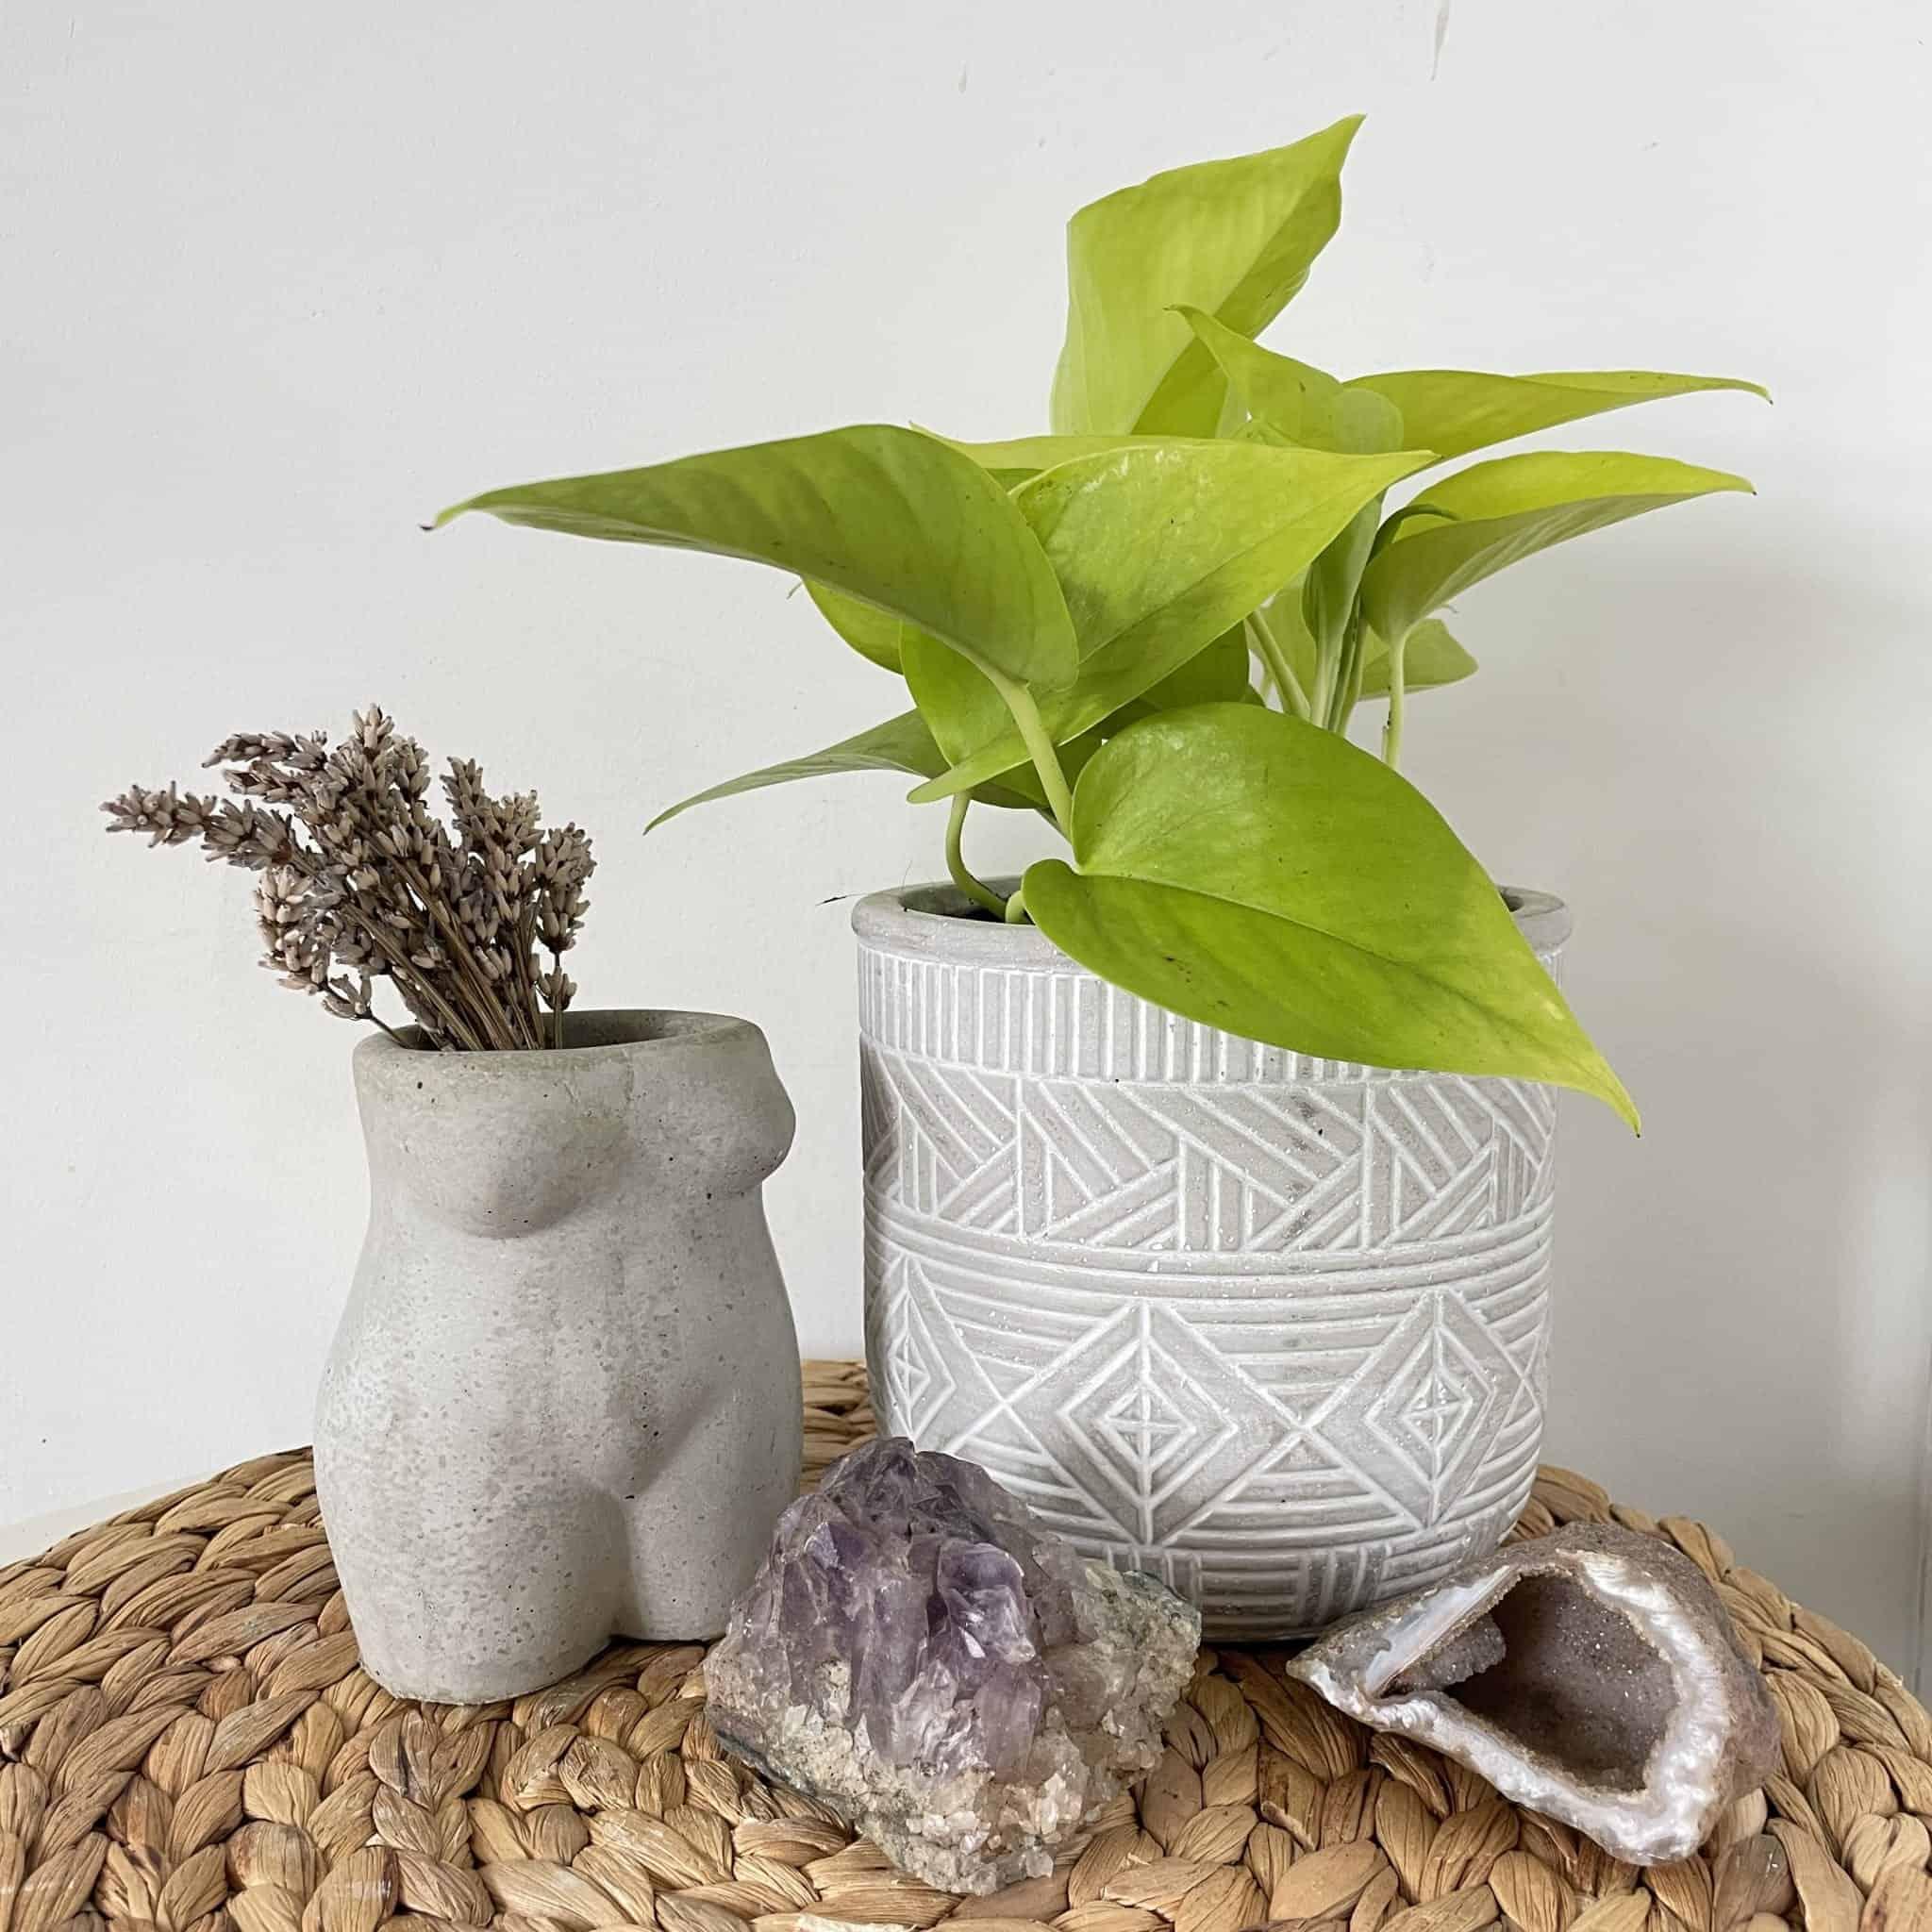 Scindapsus Neon Pothos in 12cm pot